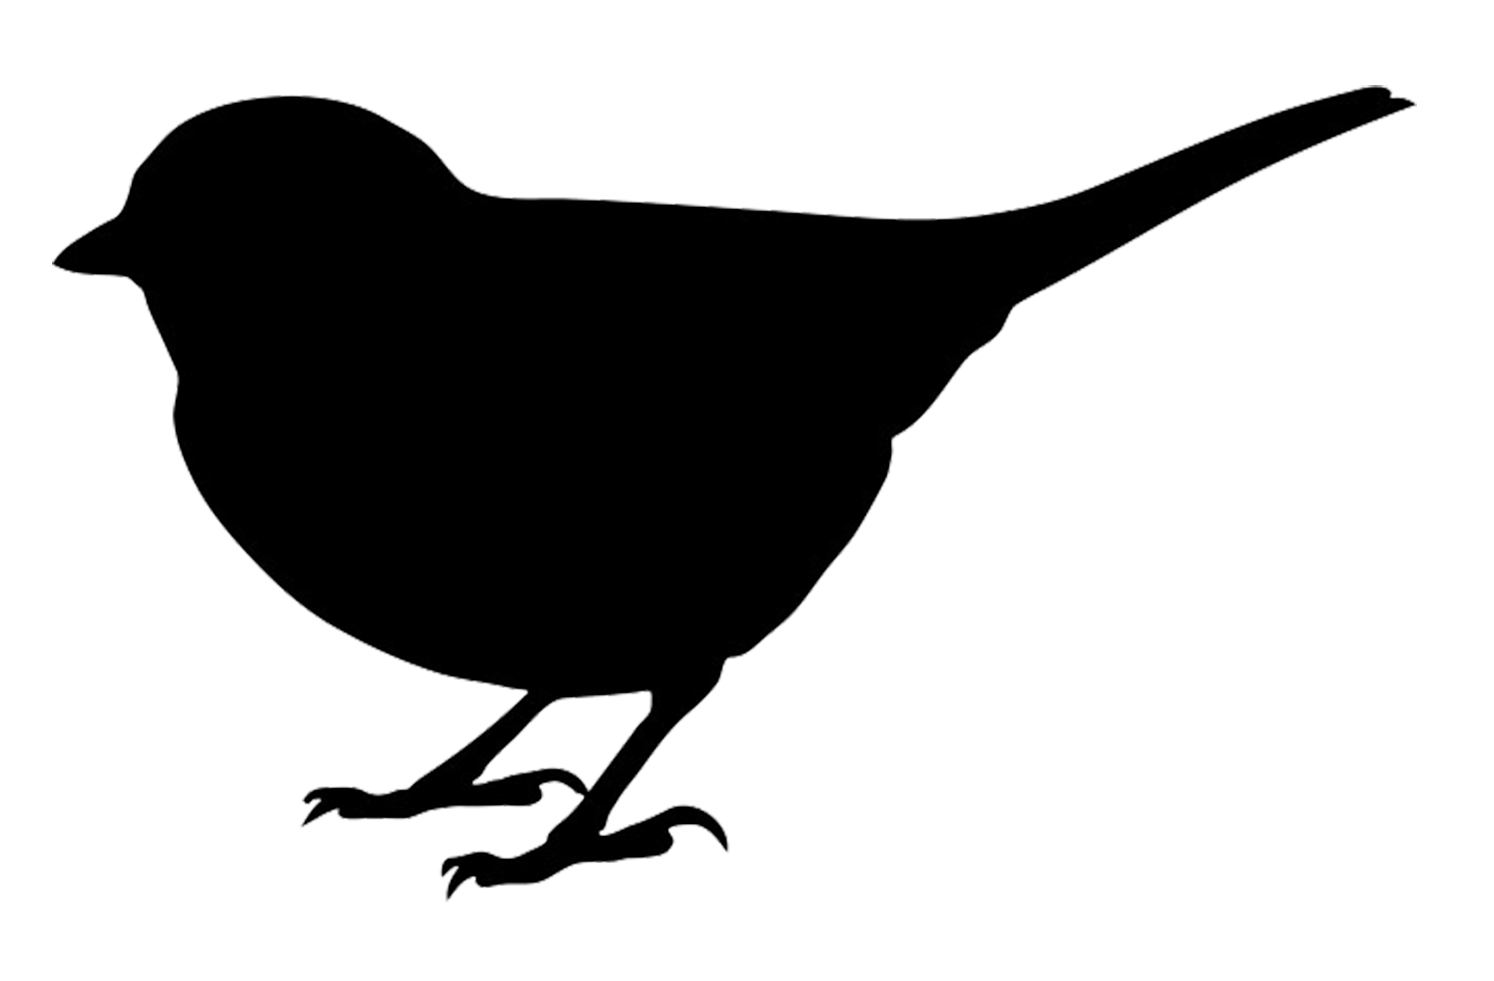 1494x981 Bird Silhouette Clip Art Many Interesting Cliparts